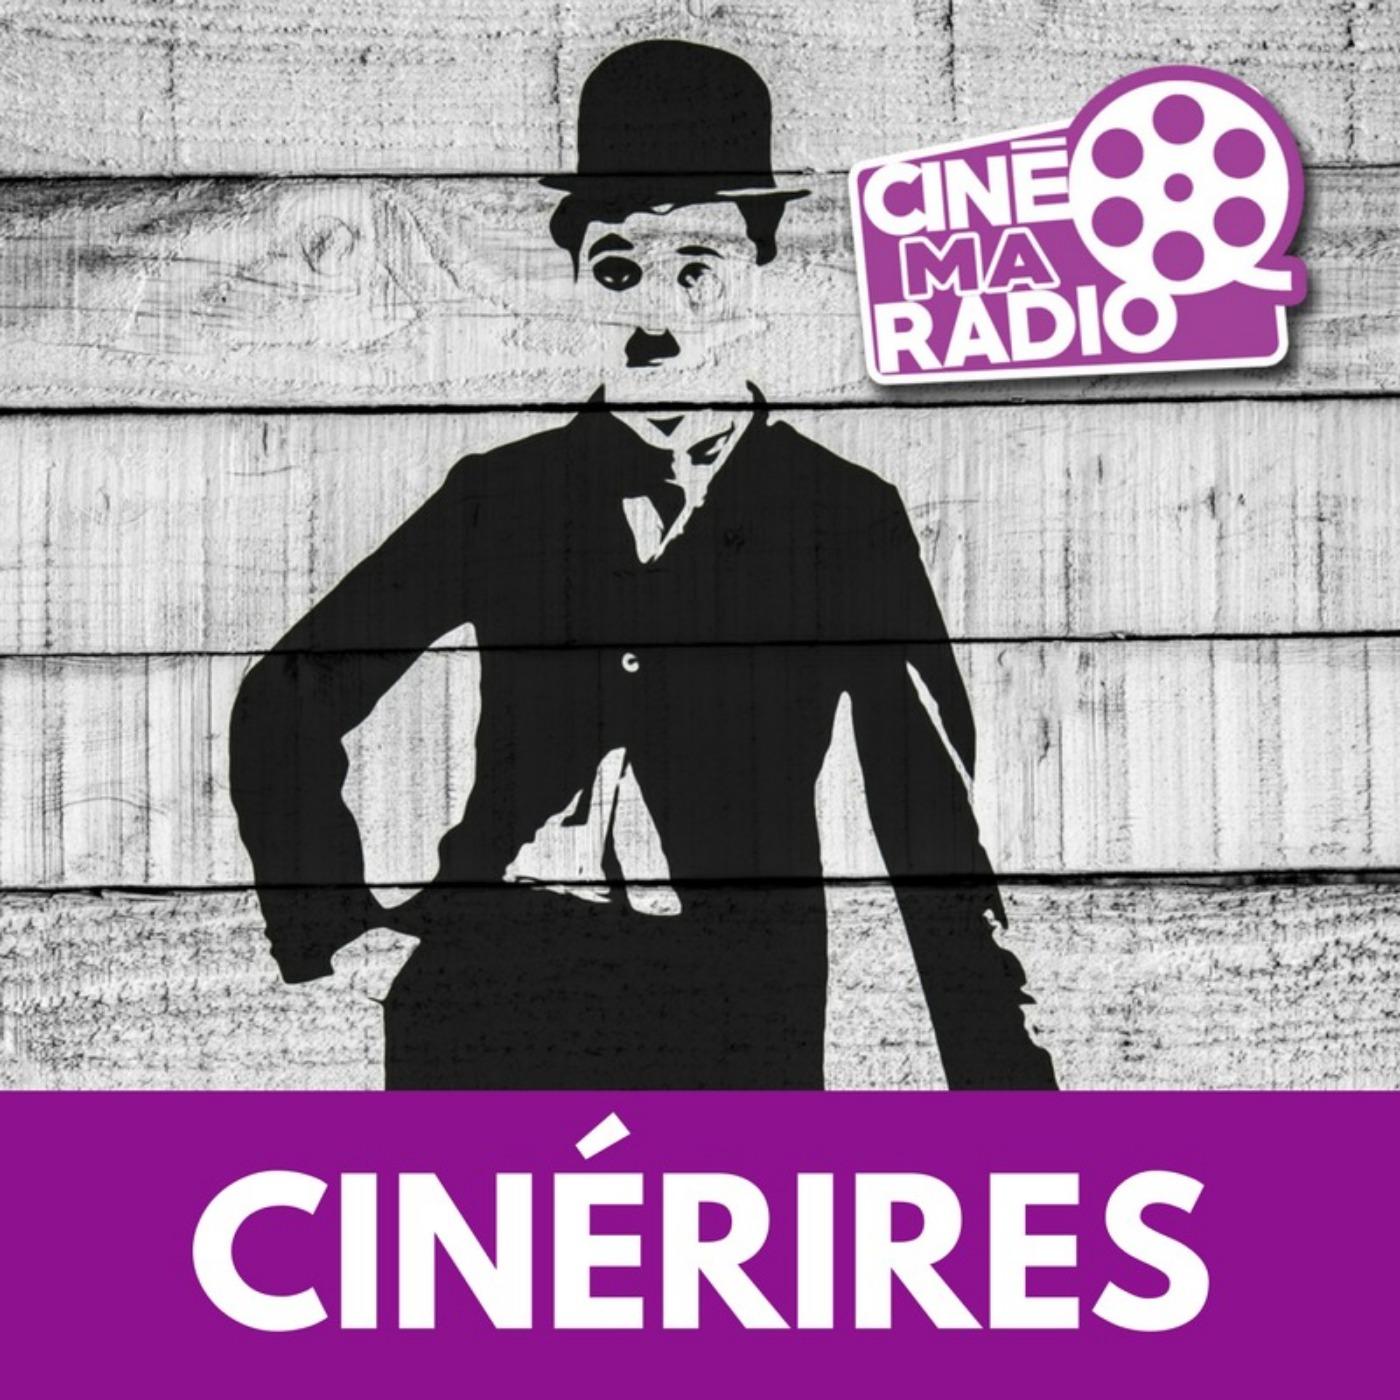 Critique du film BORAT | CinéMaRadio | CinéRires #23